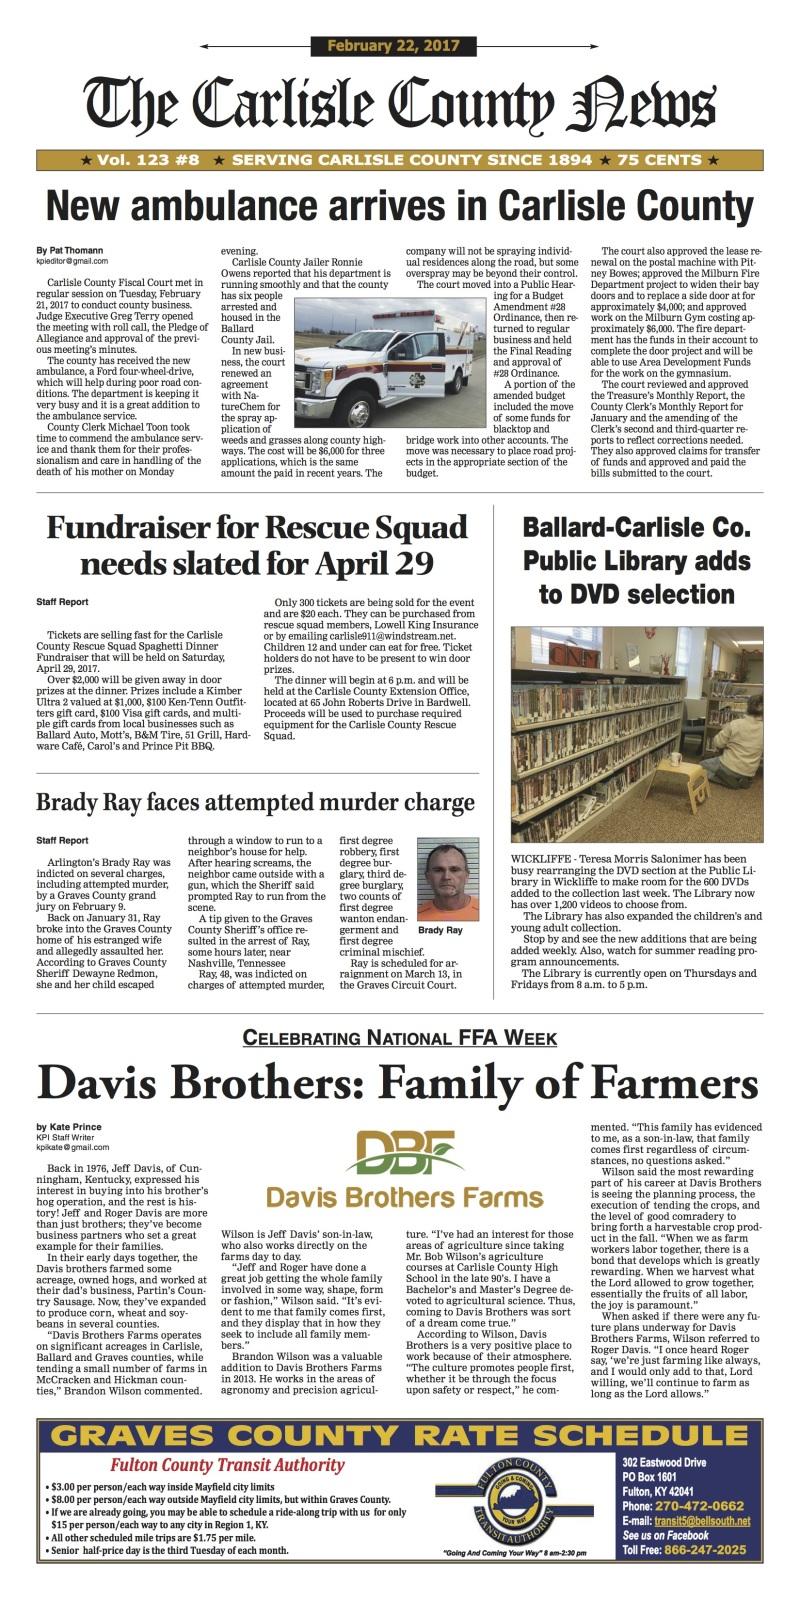 Carlisle County News 2-22-17